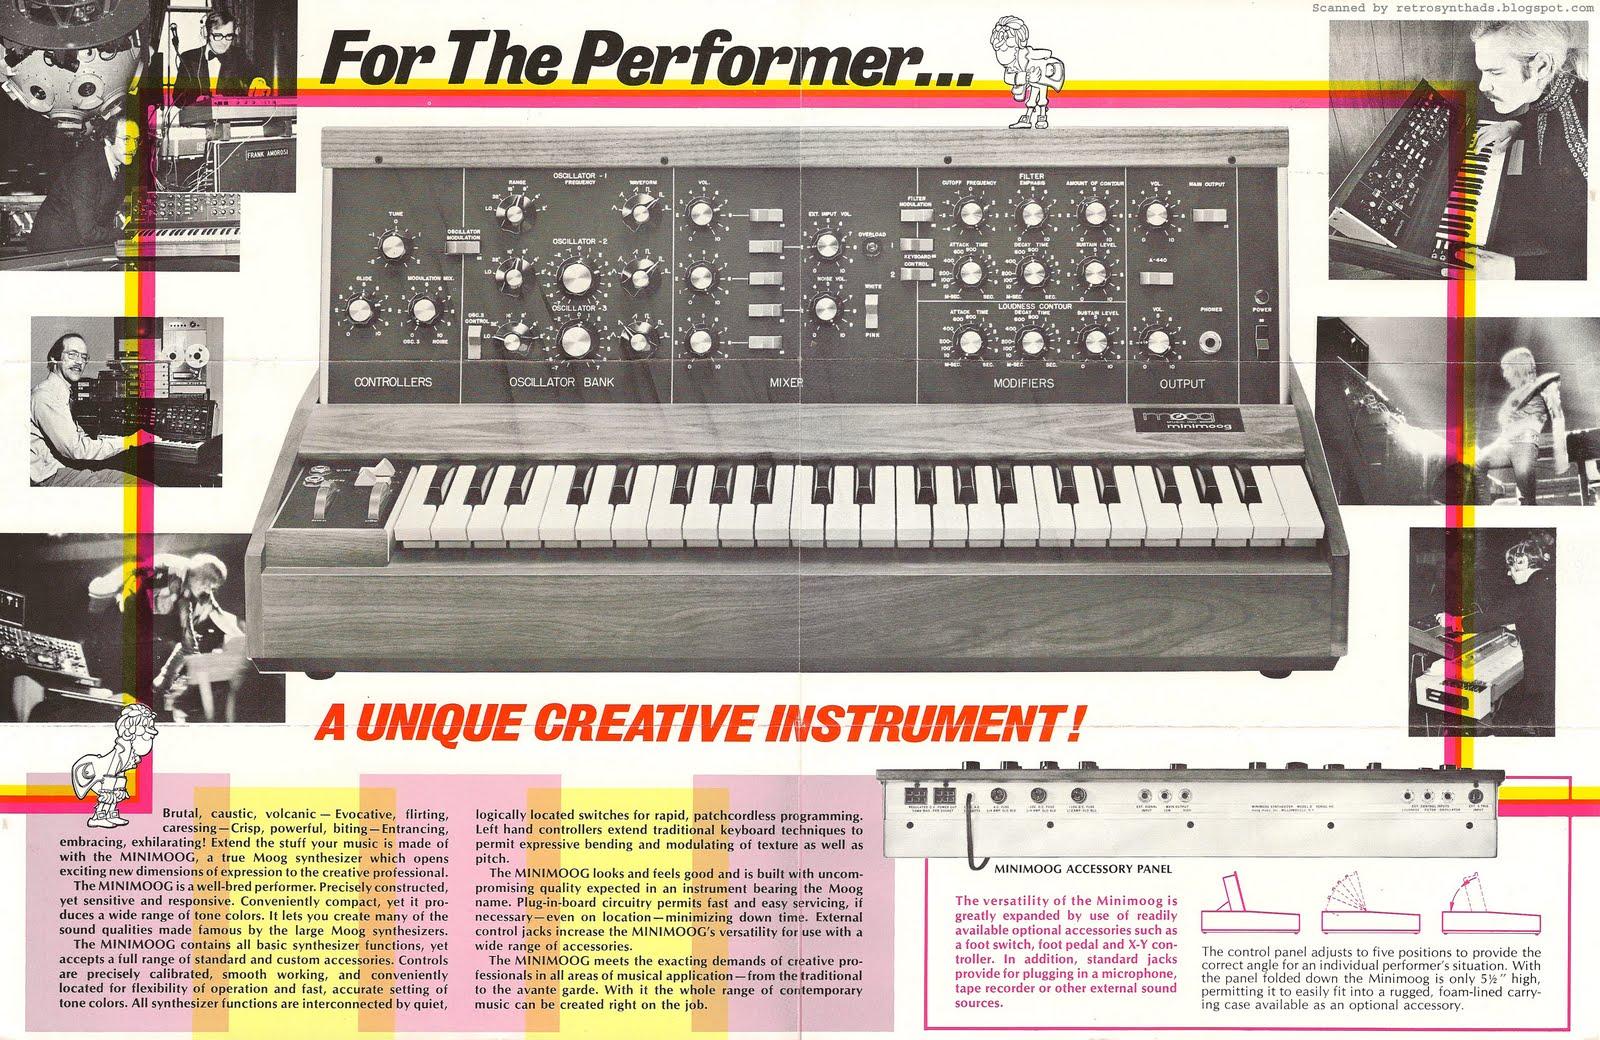 http://retrosynthads.blogspot.ca/2010/05/moog-minimoog-brochure-instrument-of.html